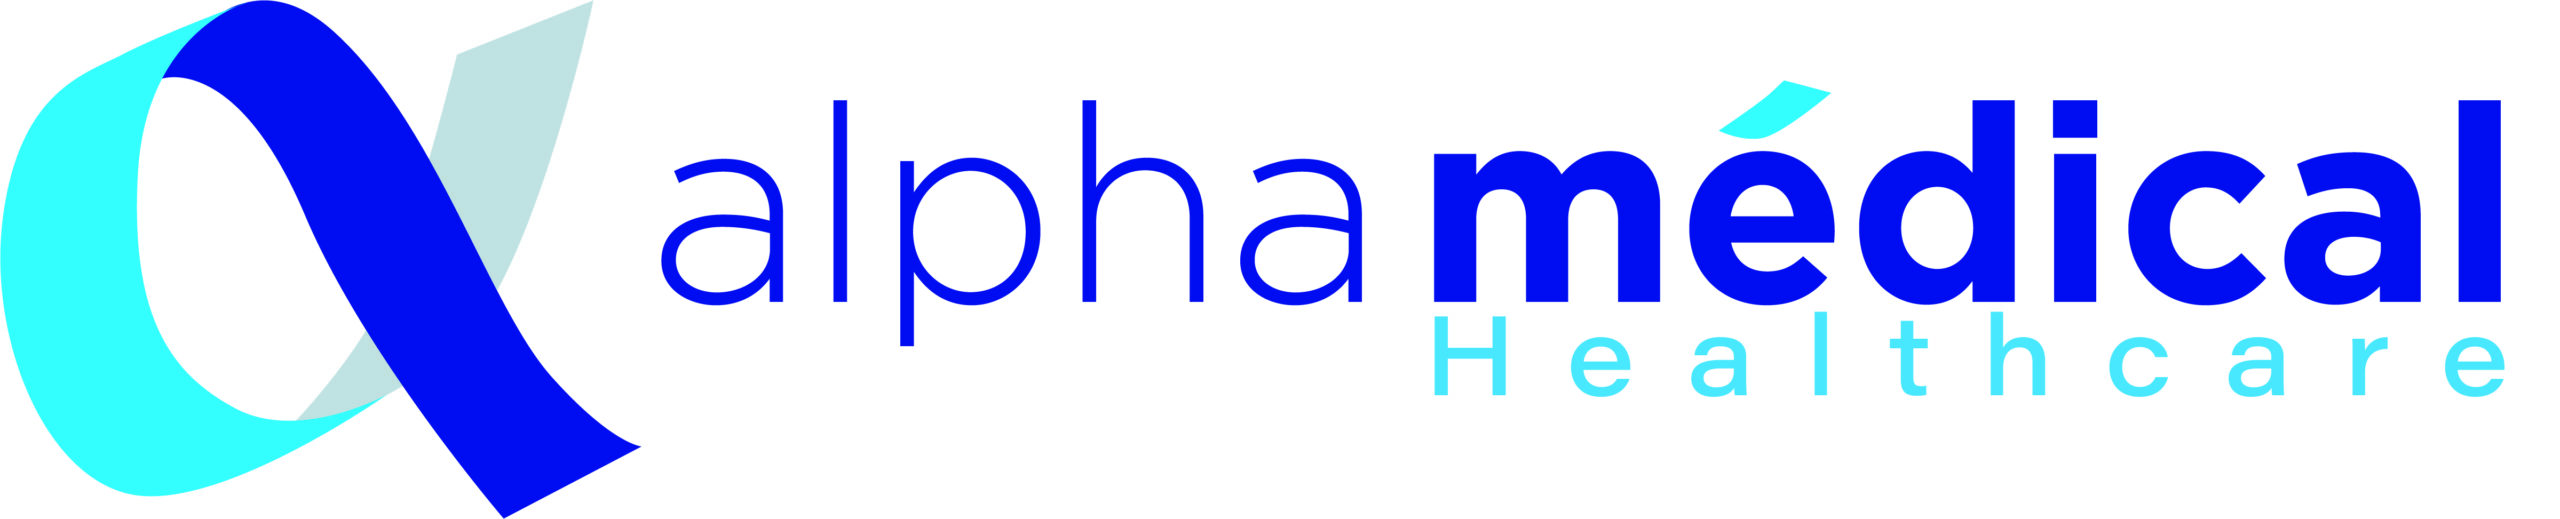 ALPHA MEDICAL HEALTHCARE